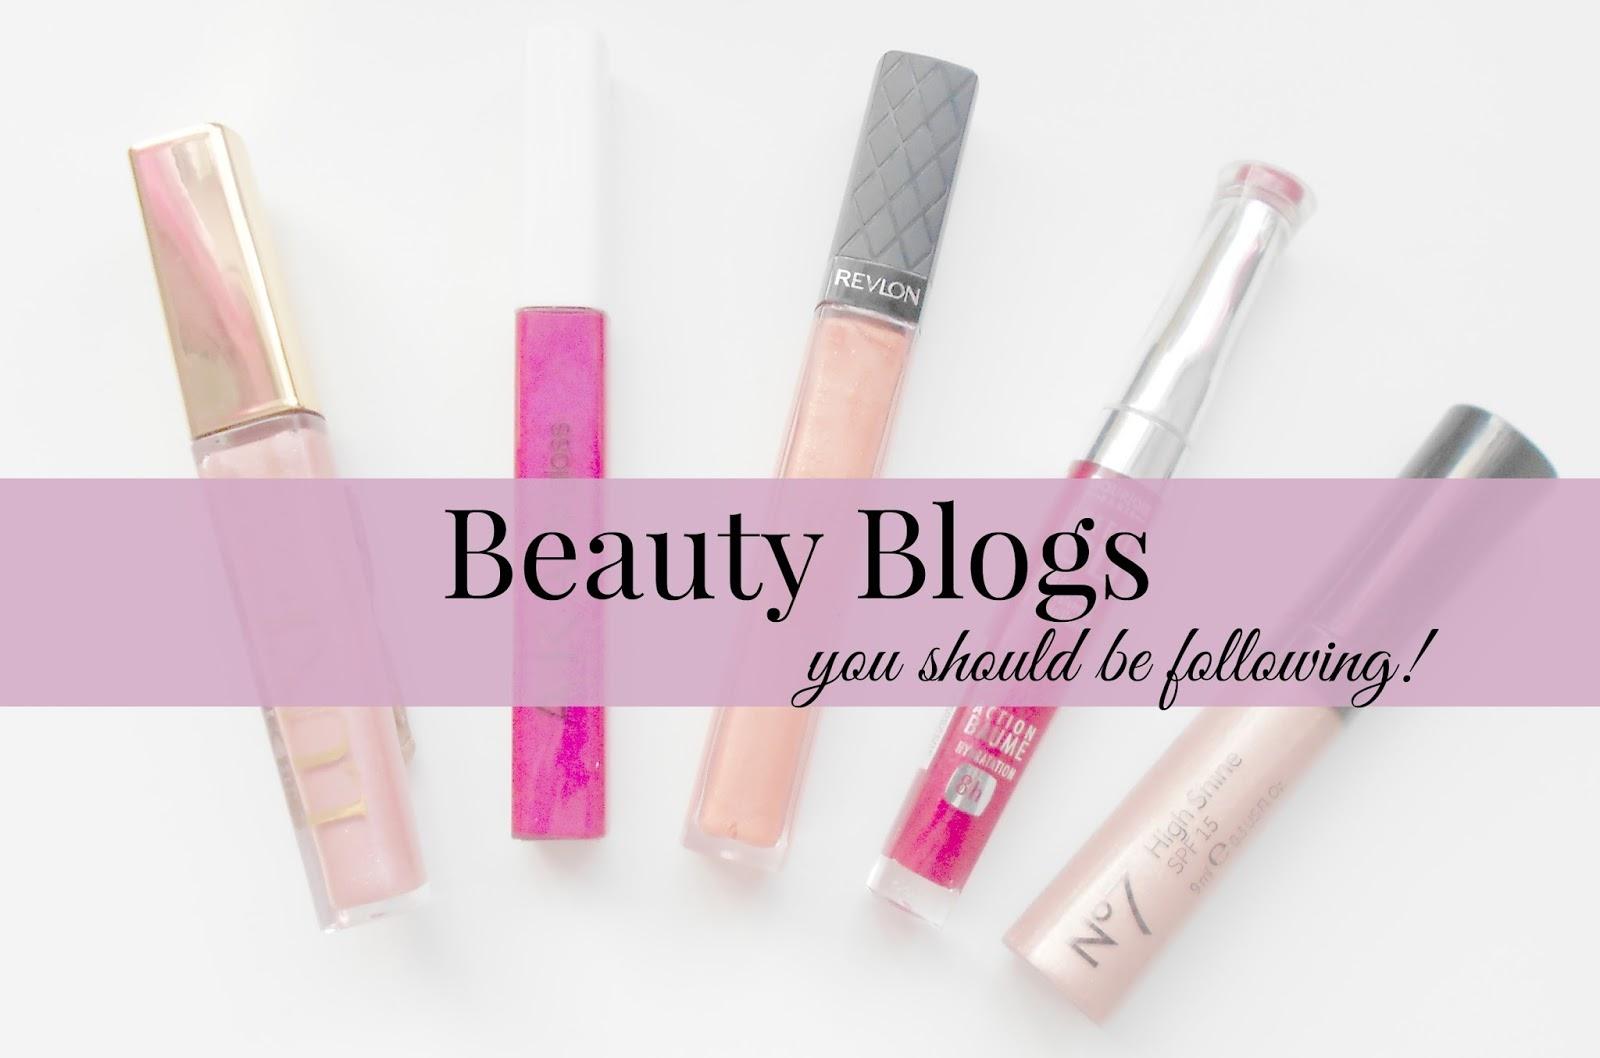 Lovely Jubbly: Beauty Blogs you should be following!